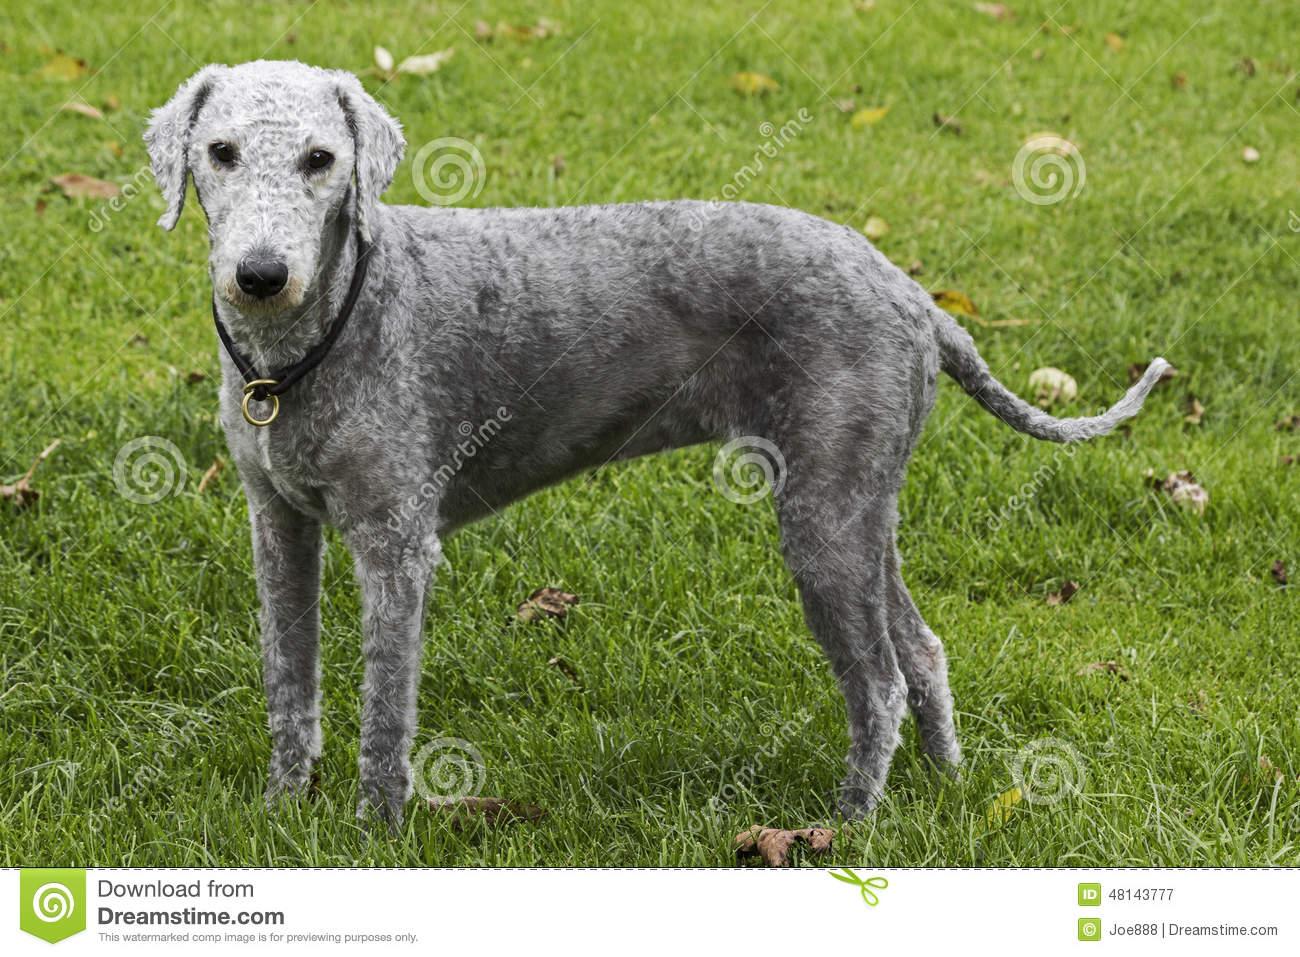 Bedlington Terrier Stock Photos, Images, & Pictures.